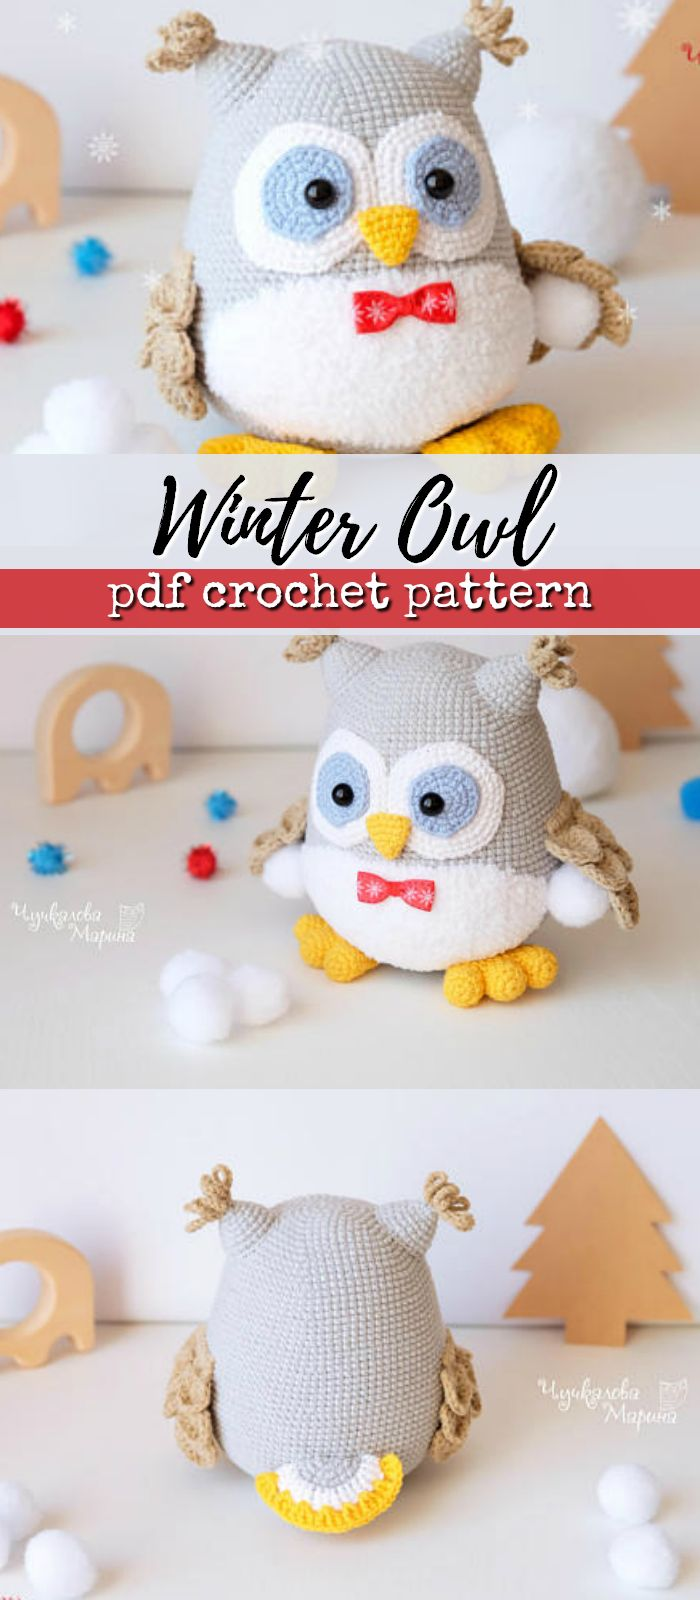 what a cute little winter owl crochet pattern! I love owls! #amigurumi #stuffed #toy #plushie #winter #handmade #etsy #affiliate